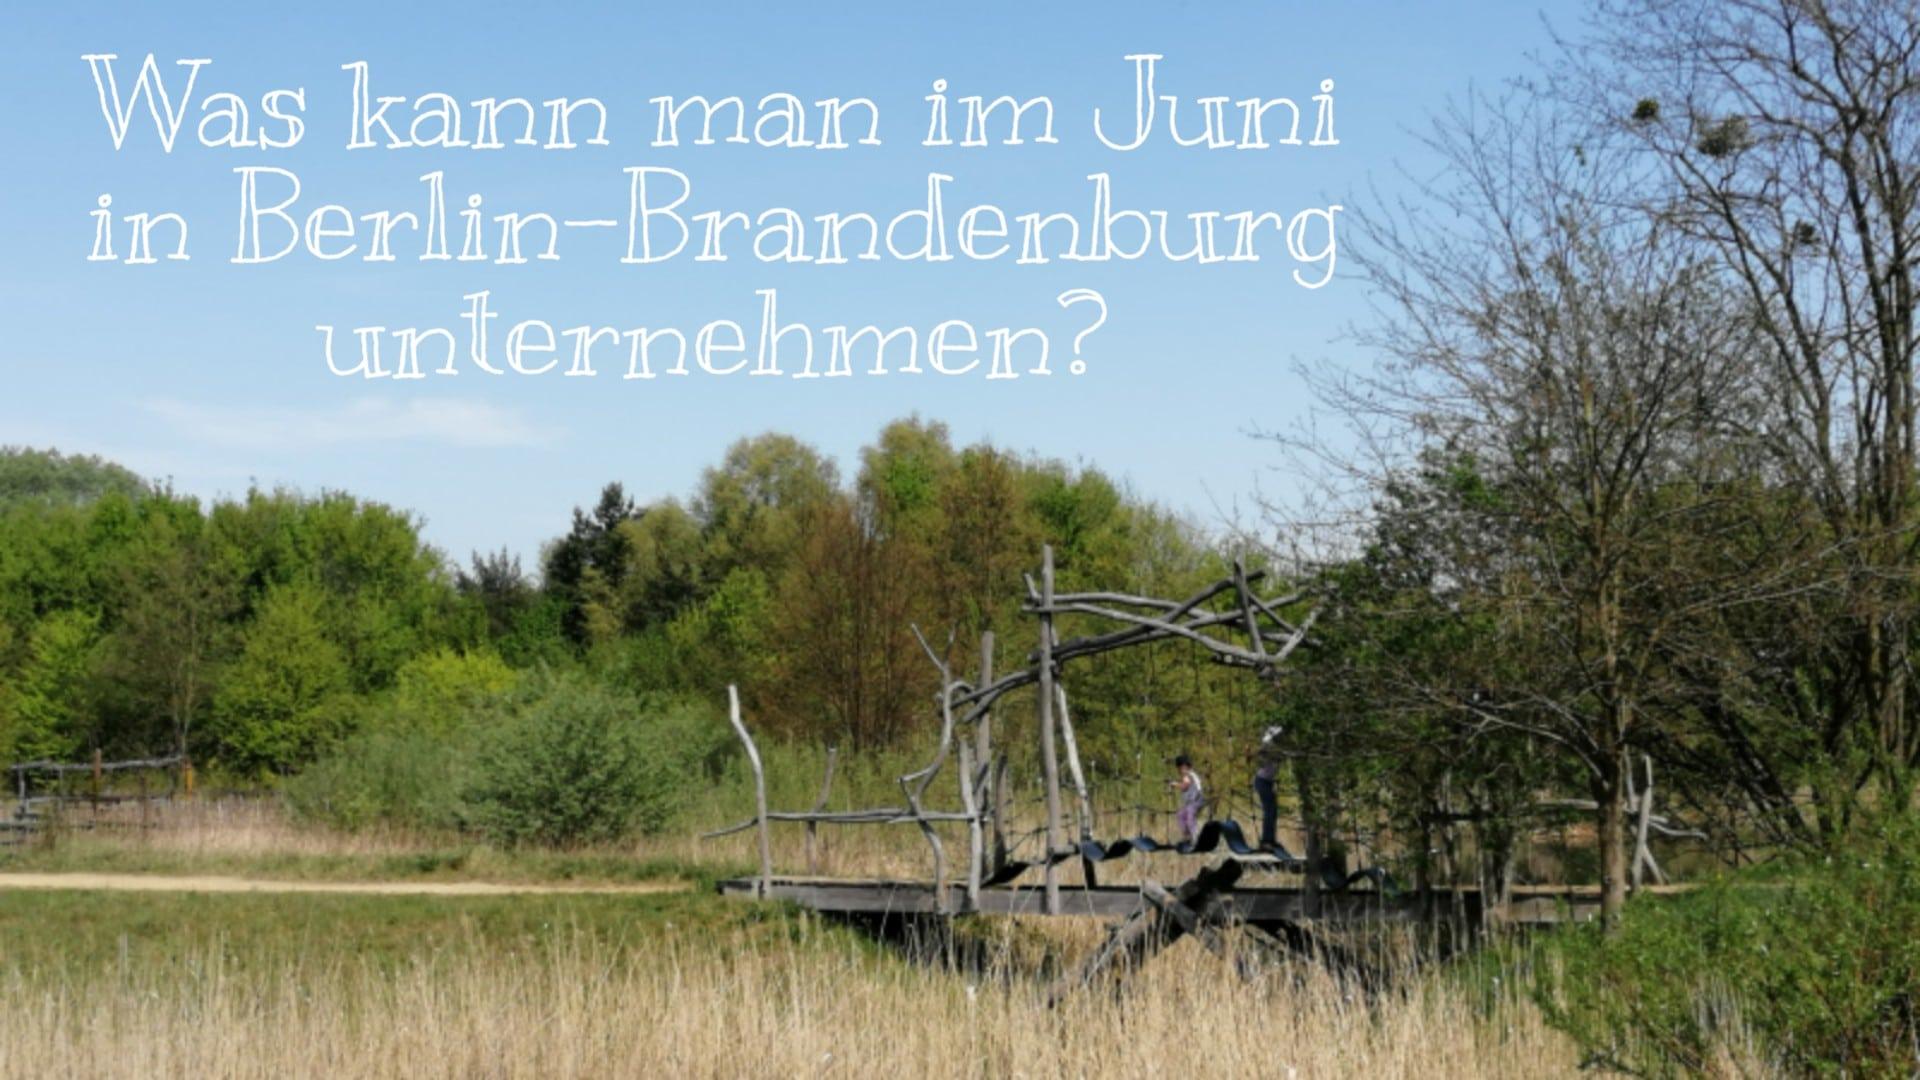 Juni, Veranstaltungen, Familien, Events, Kinder, Berlin, Brandenburg, Bio, Termine, Natur, Tiere, Pferde